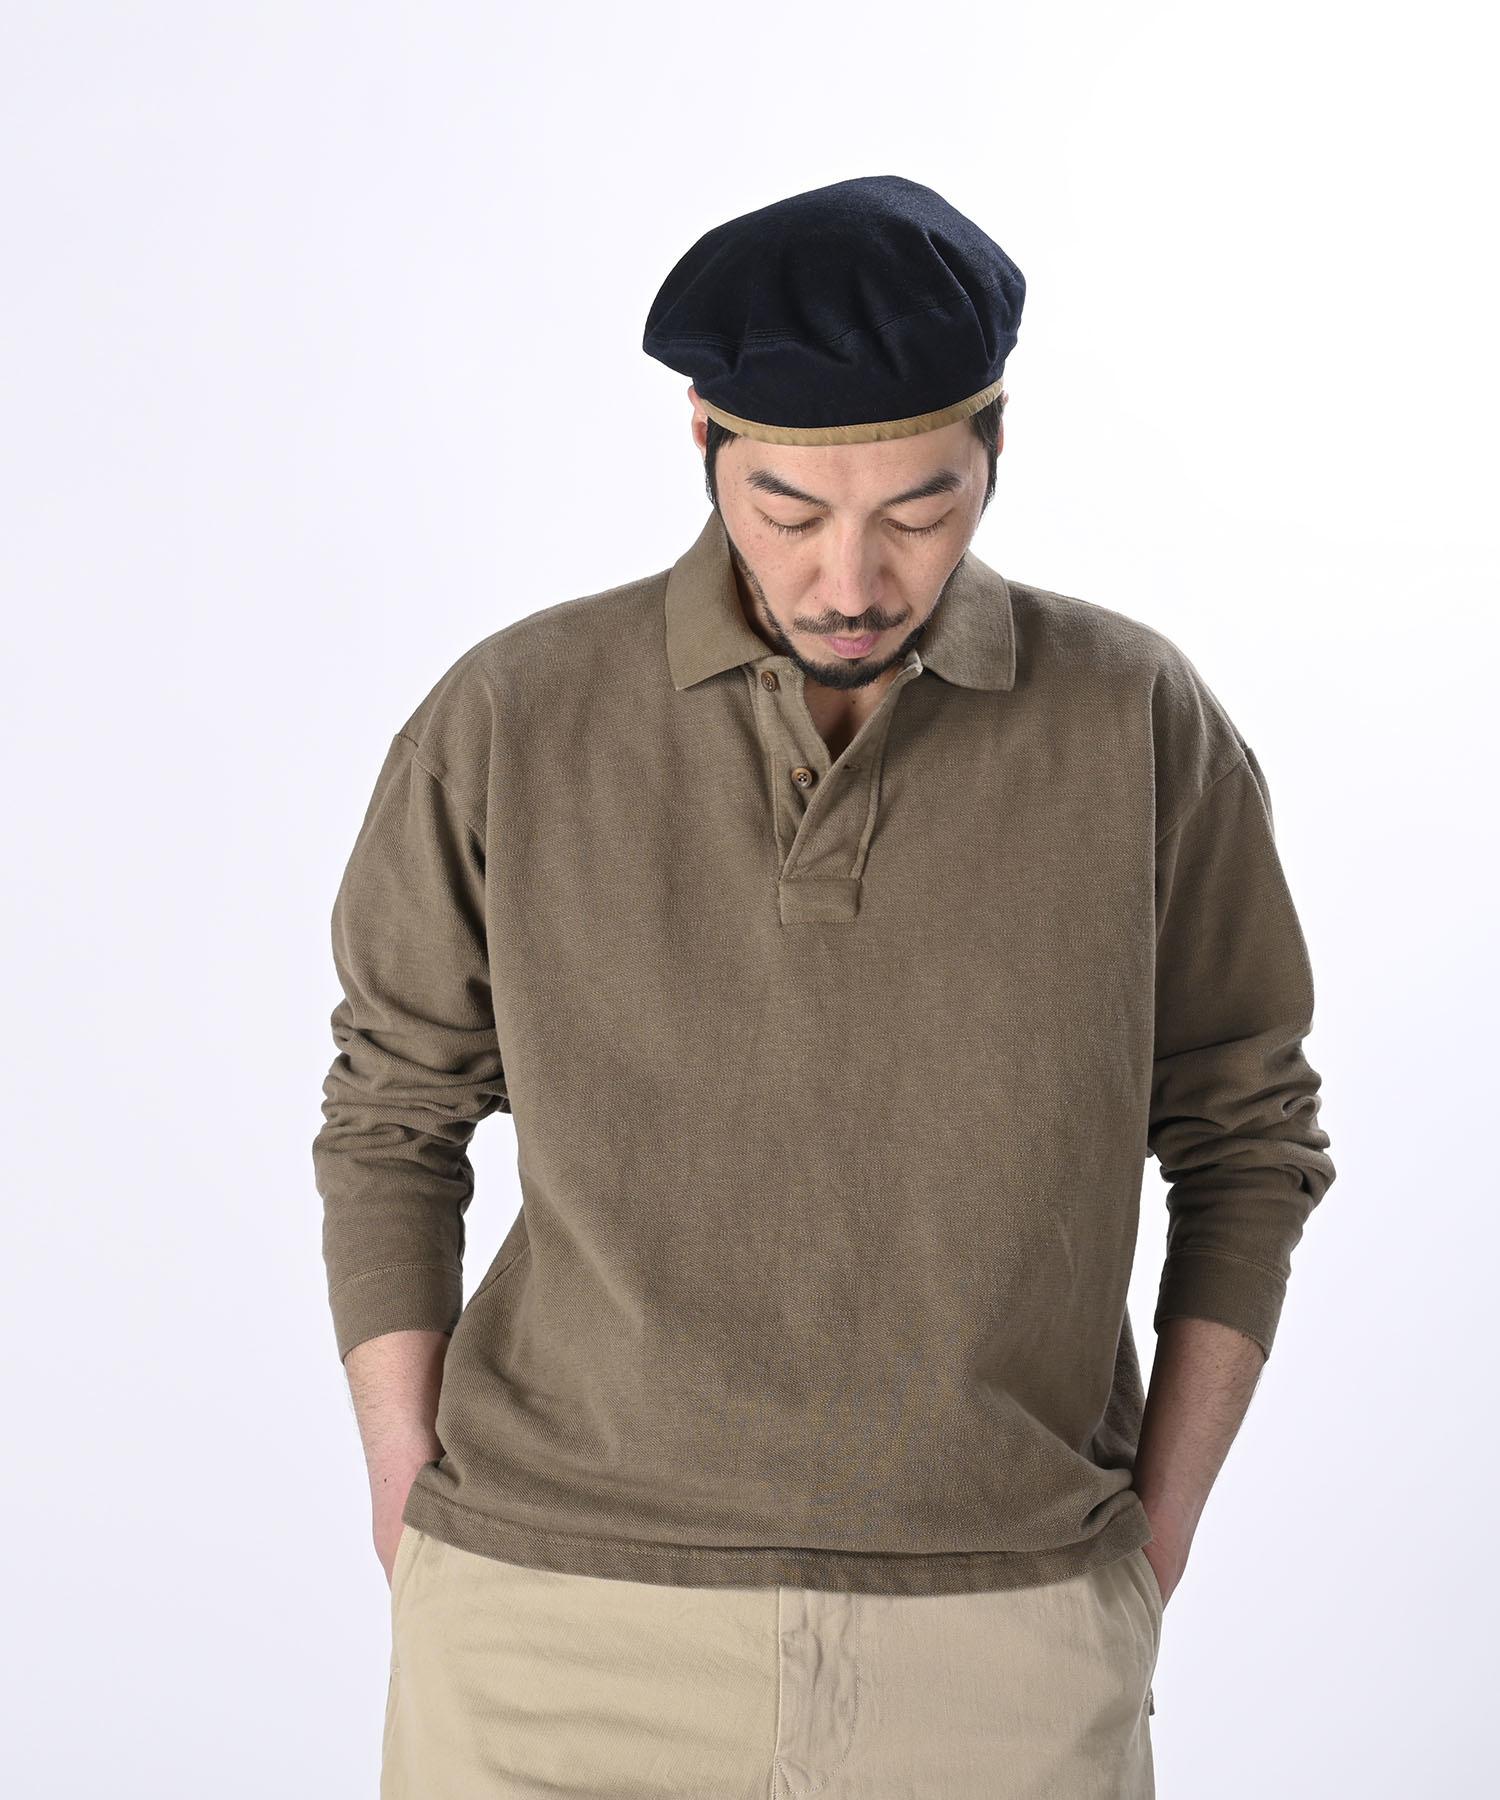 Kanoko Ocean Shiokaze Long-sleeved Polo Shirt (0421)-3